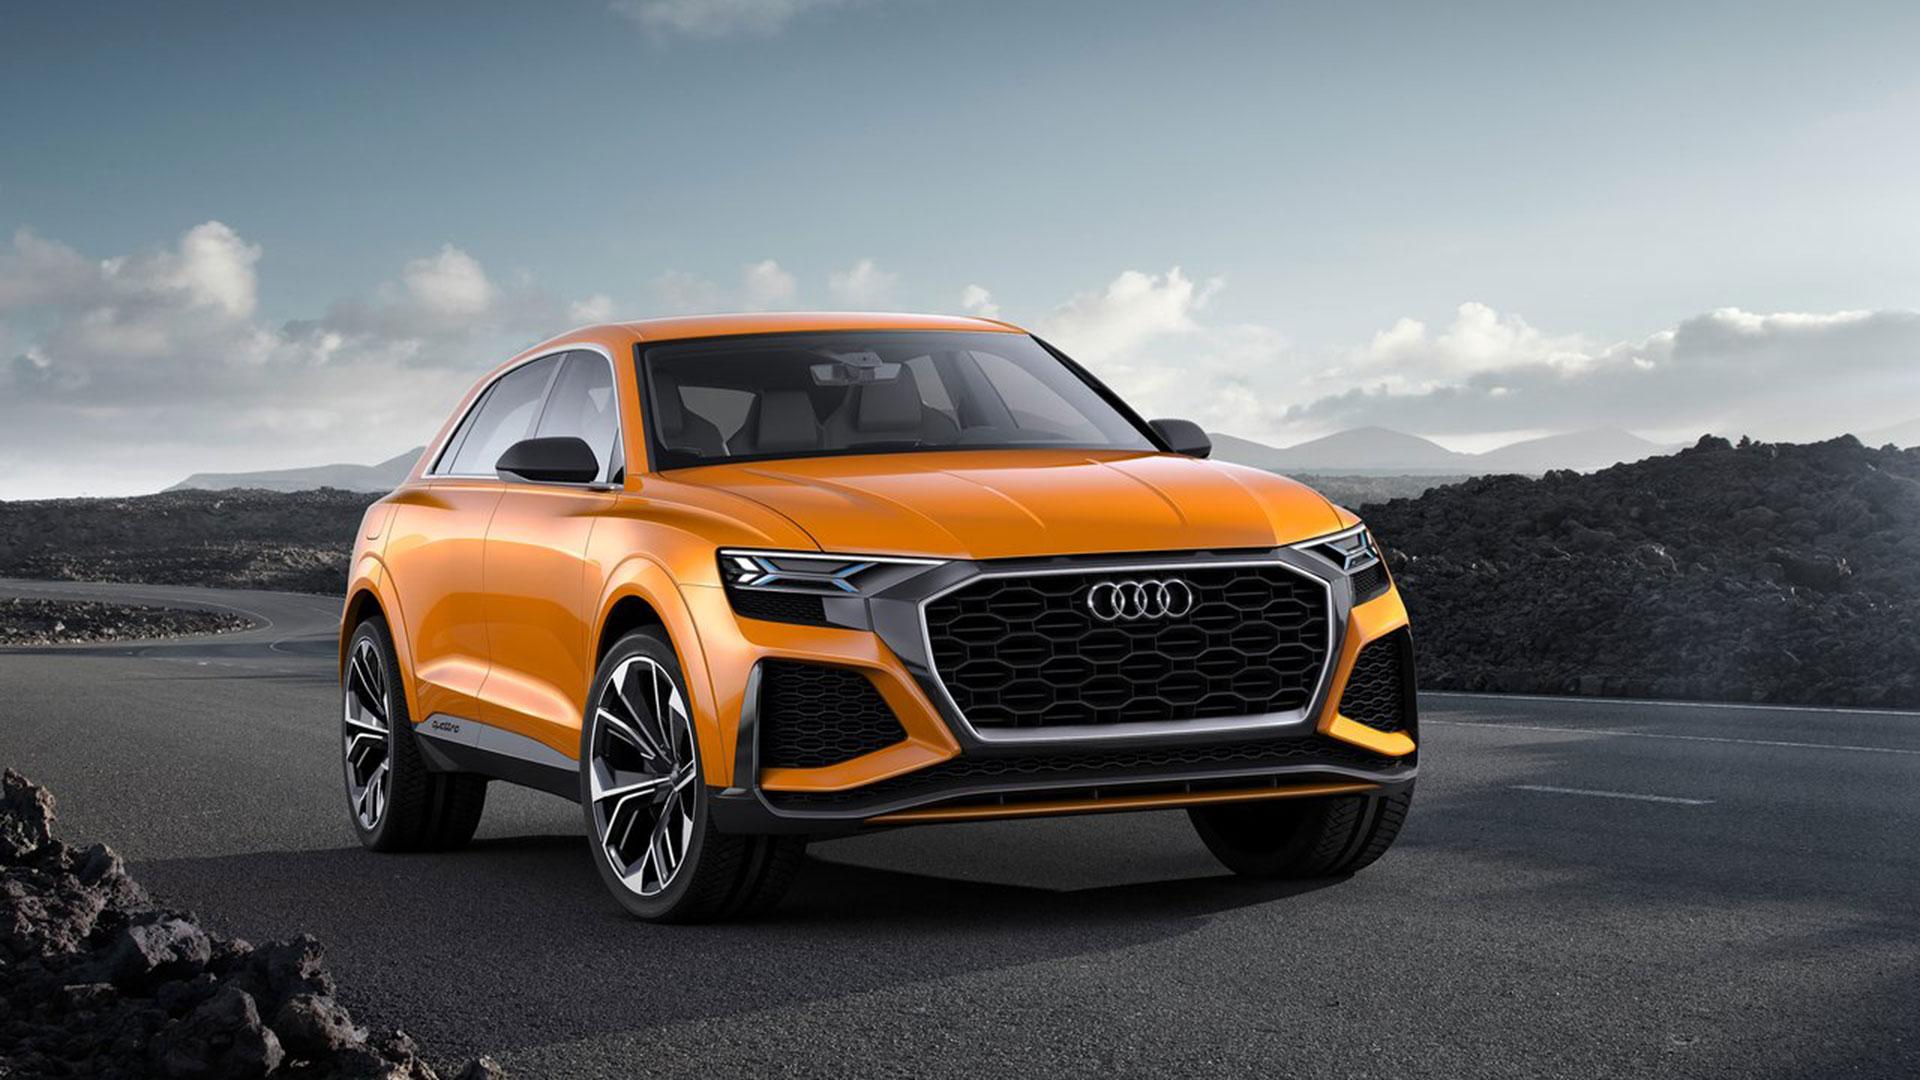 Audi-Q8_Sport_Concept-2017-1280-03.jpg